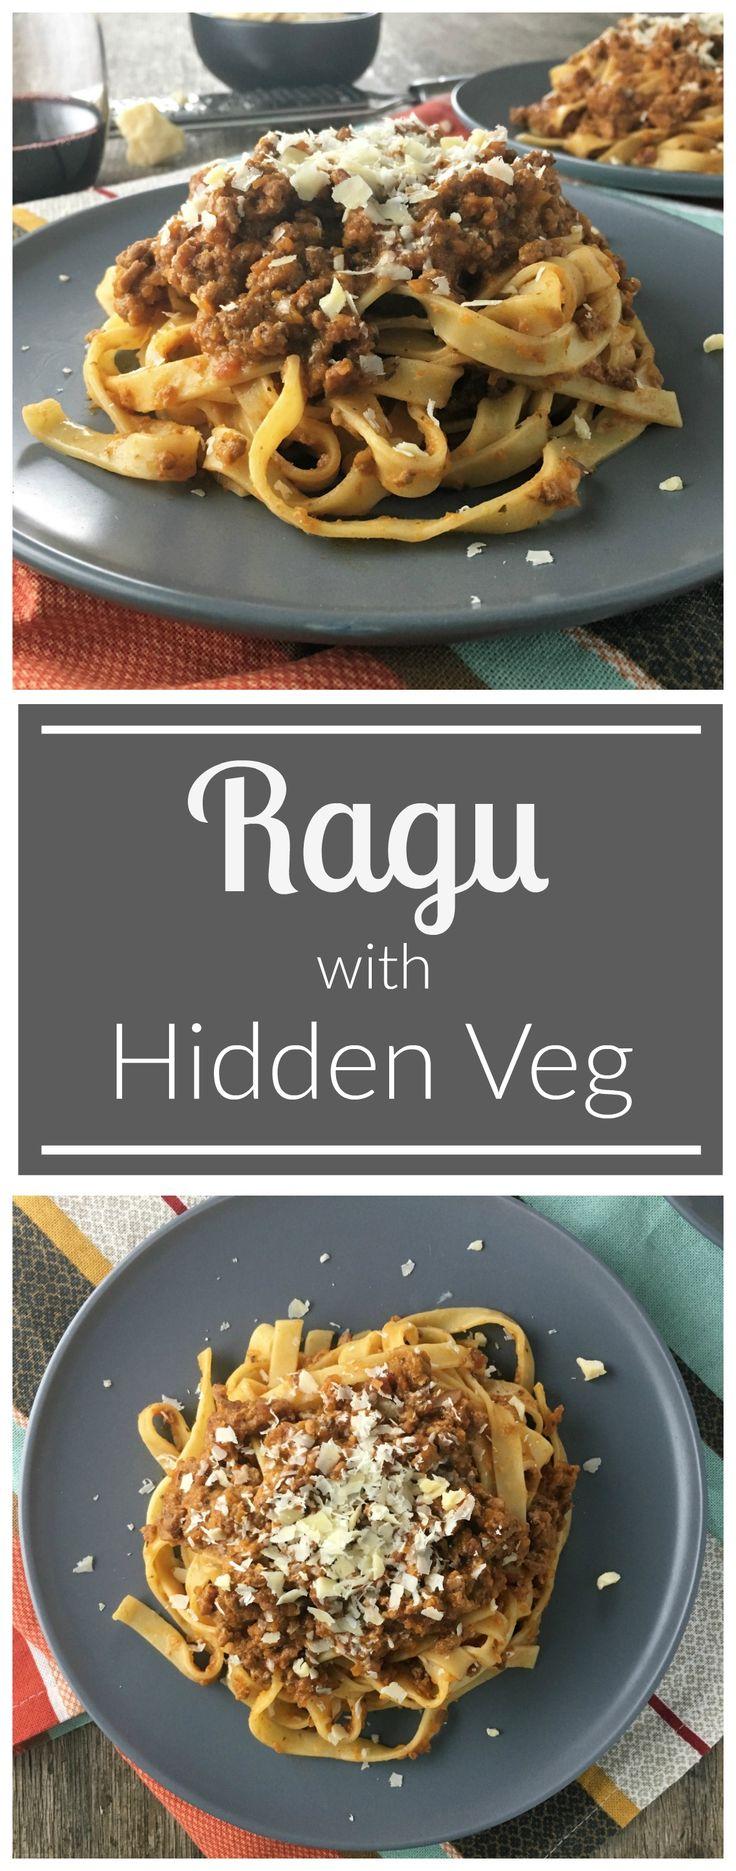 A rich pasta meat sauce with hidden veg the kids won't see...